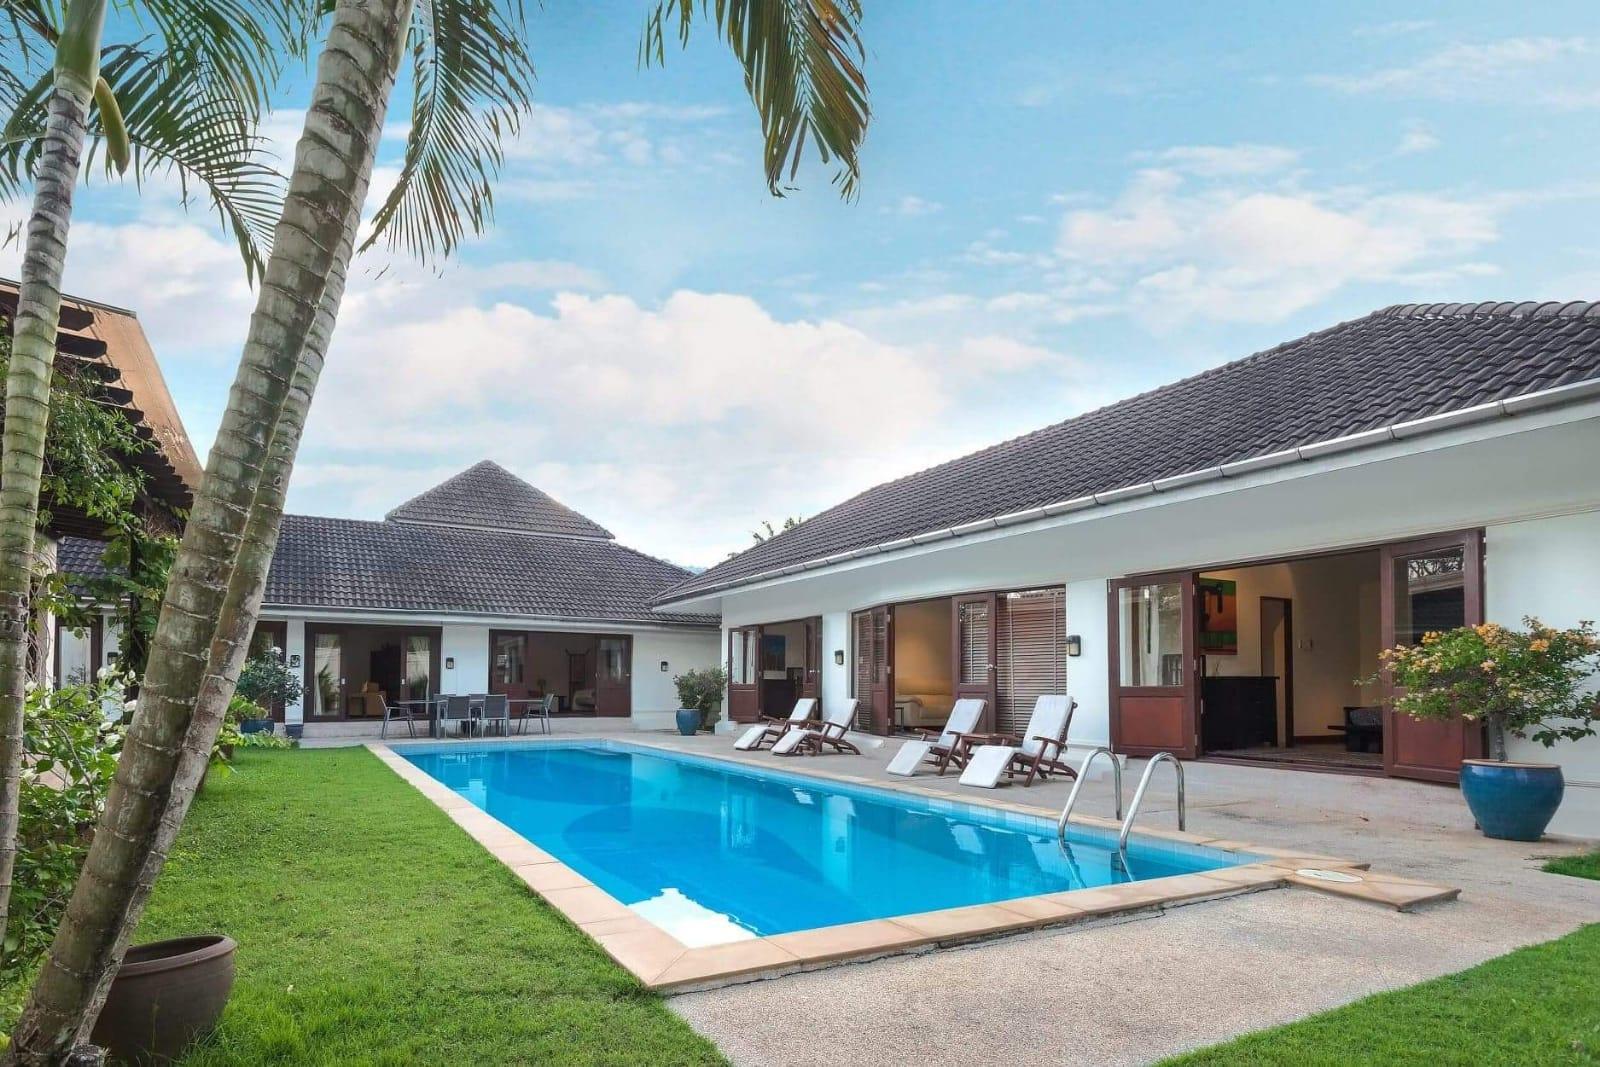 See Loch Palm Courtyard Pool Villa details